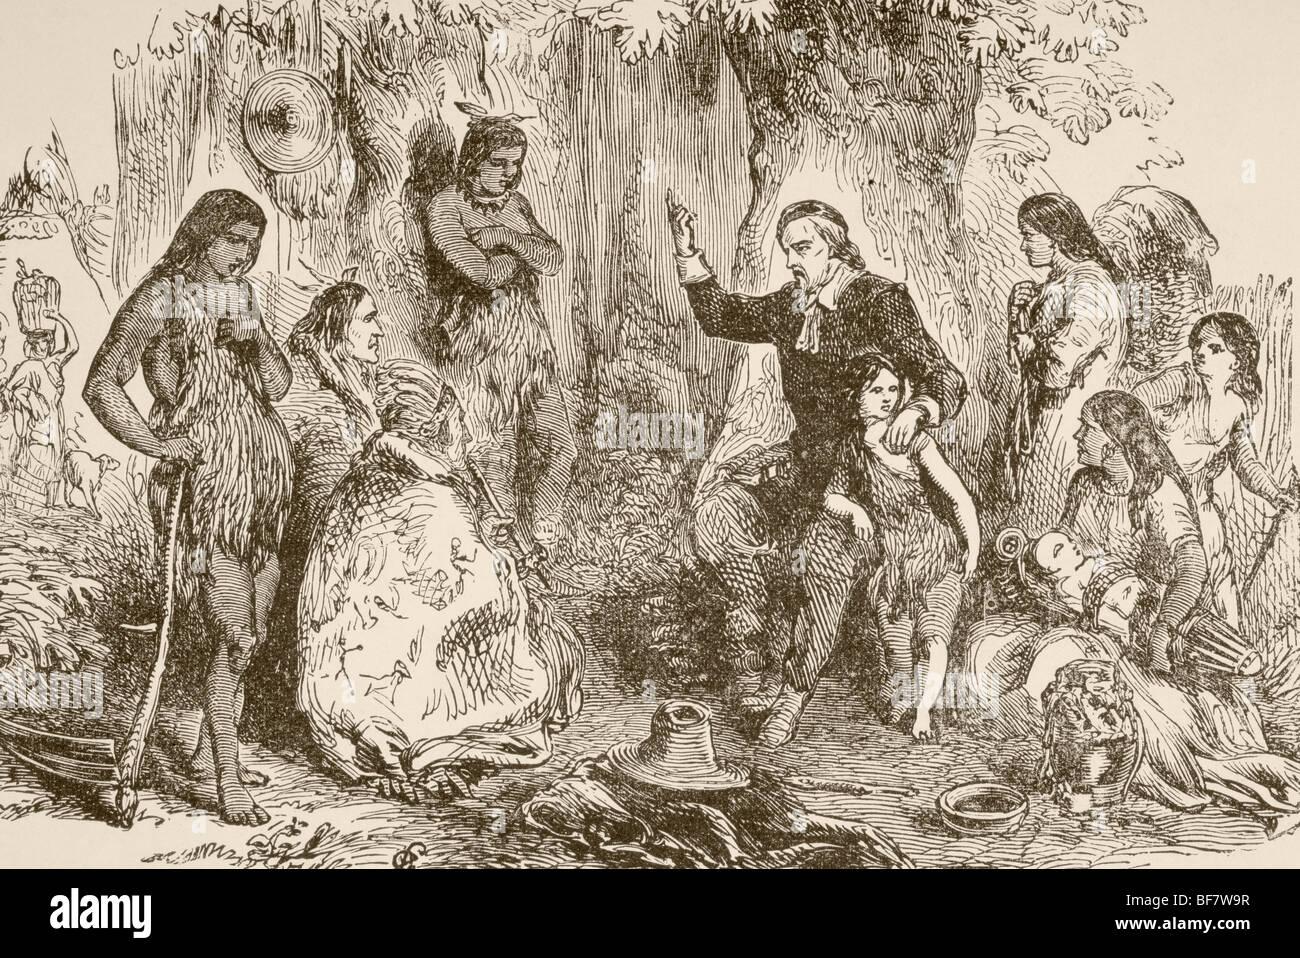 John Eliot circa 1604 to 1690. English born Puritan missionary who preached to Massachusett Indians. - Stock Image